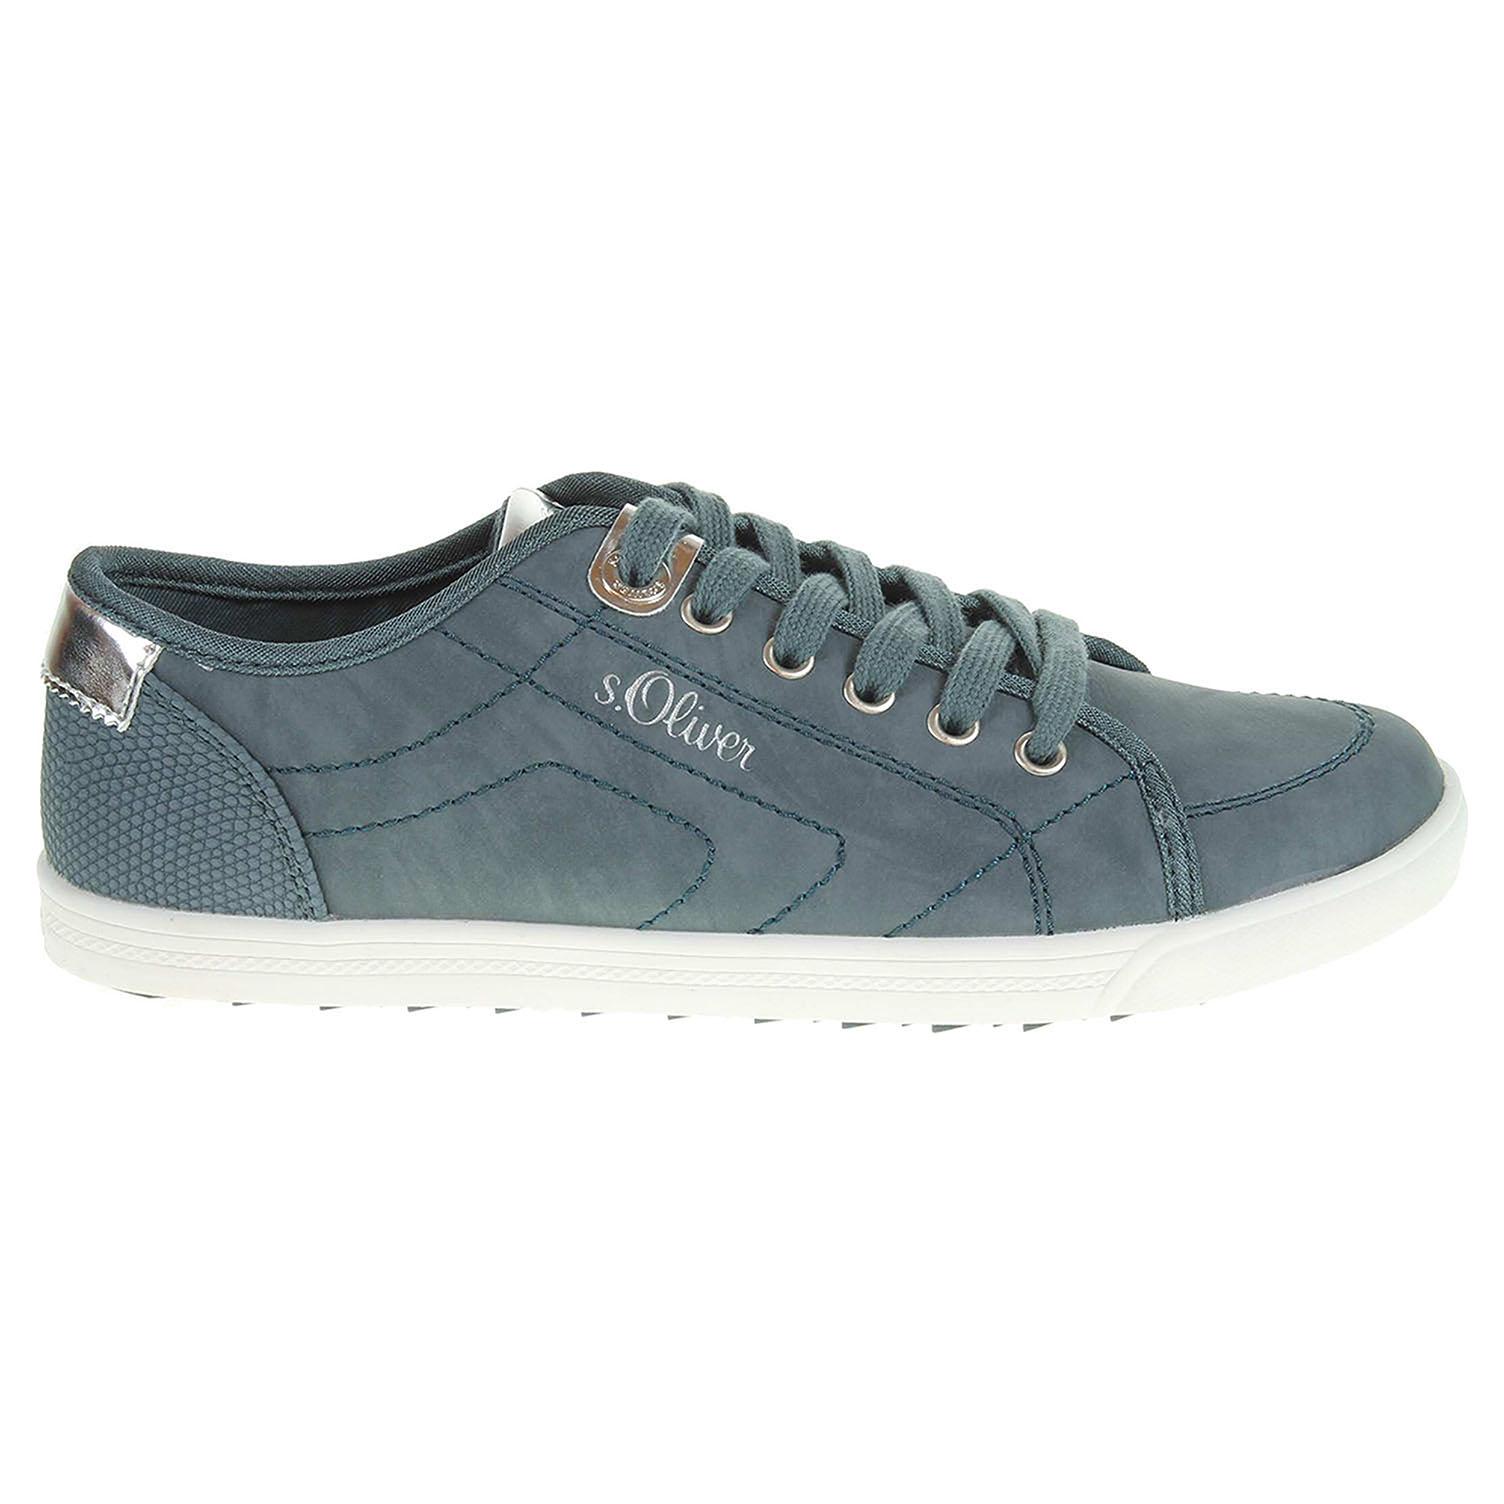 s.Oliver dámská obuv 5-23631-28 modrá 36 modrá modrá